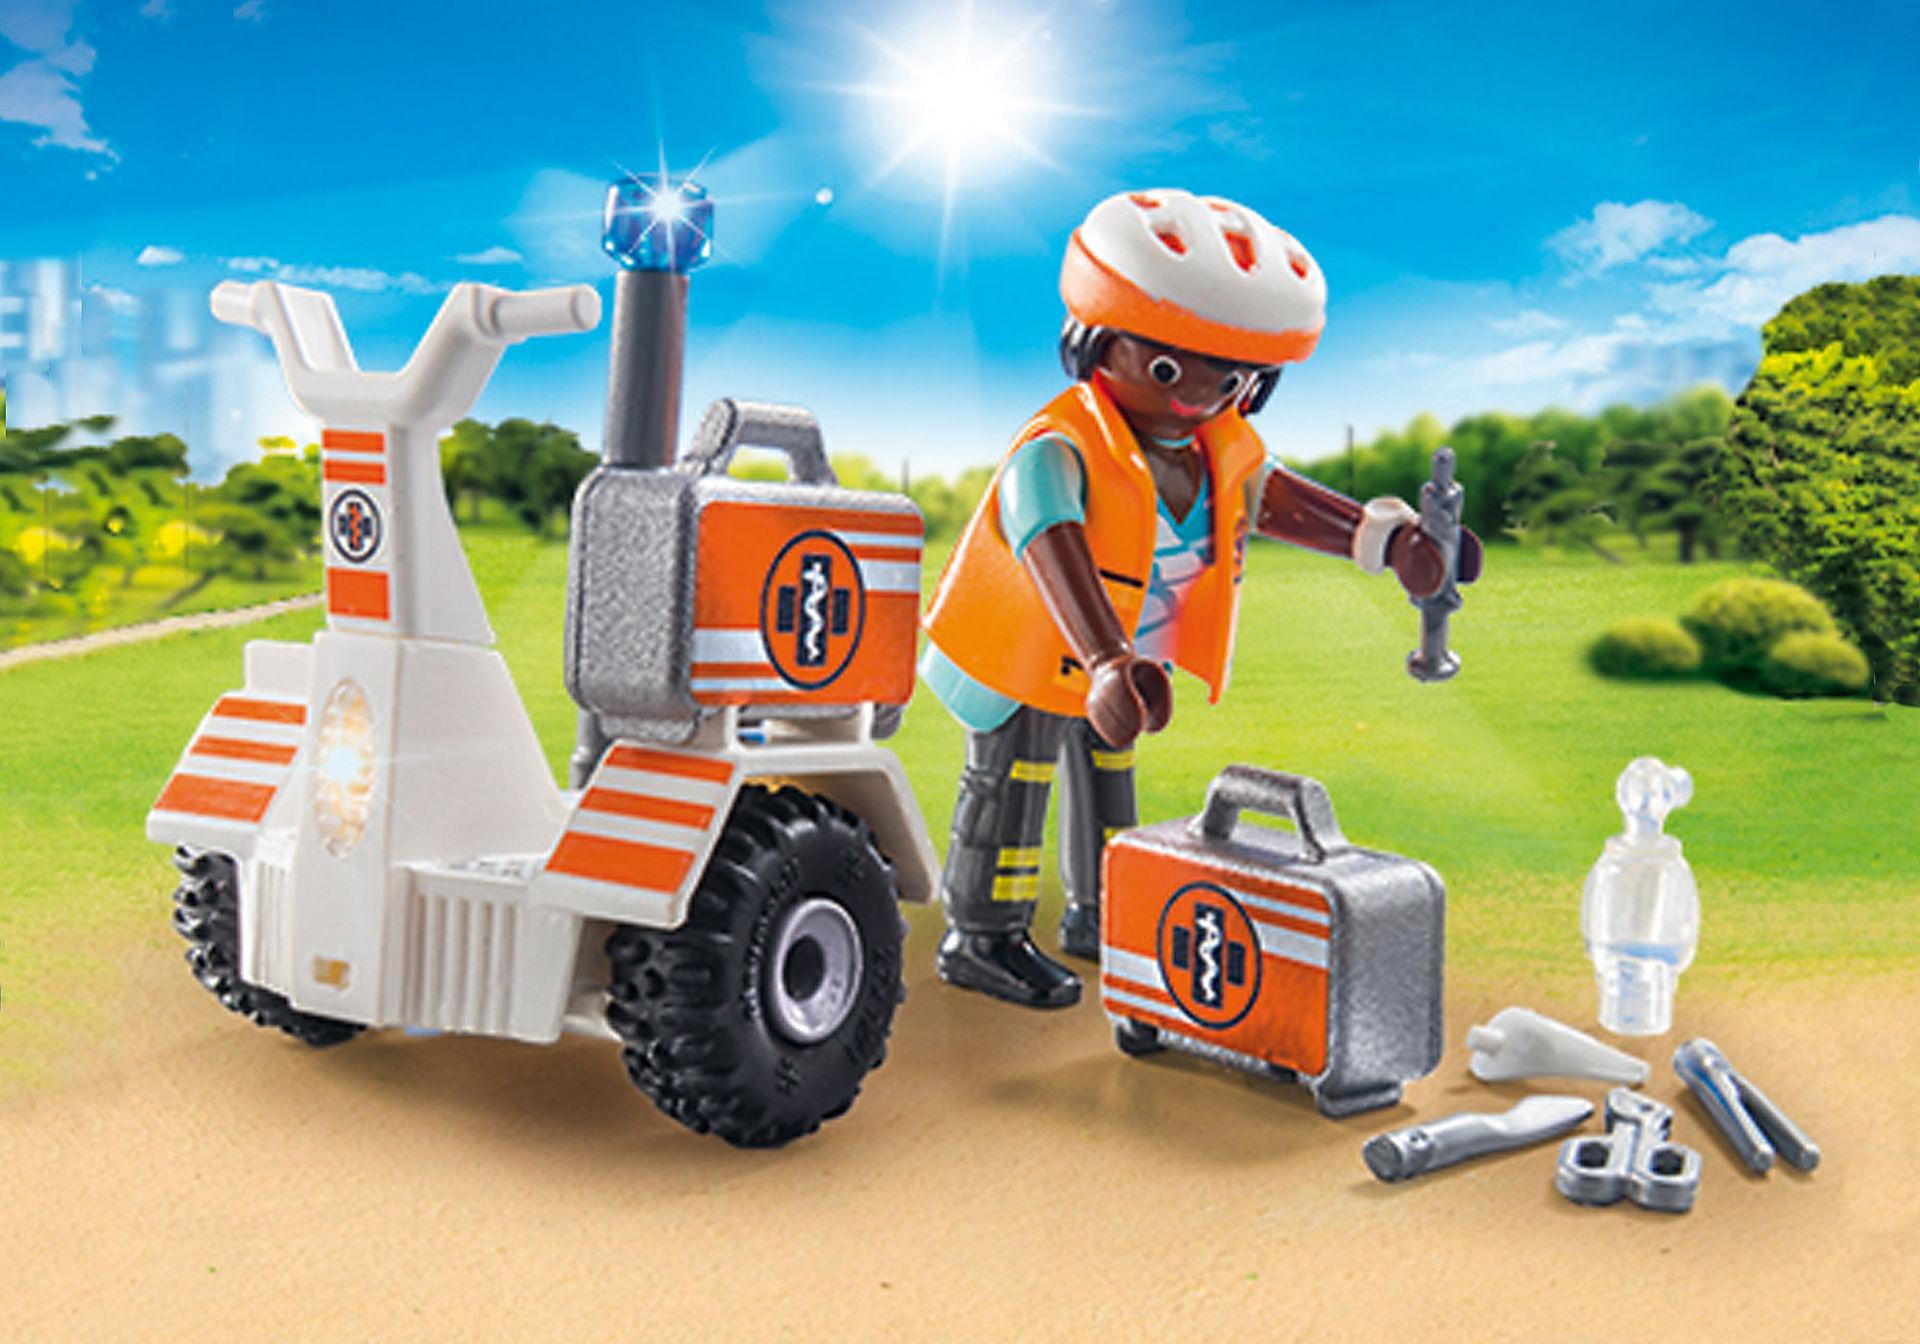 http://media.playmobil.com/i/playmobil/70052_product_extra1/Rettungs-Balance-Roller